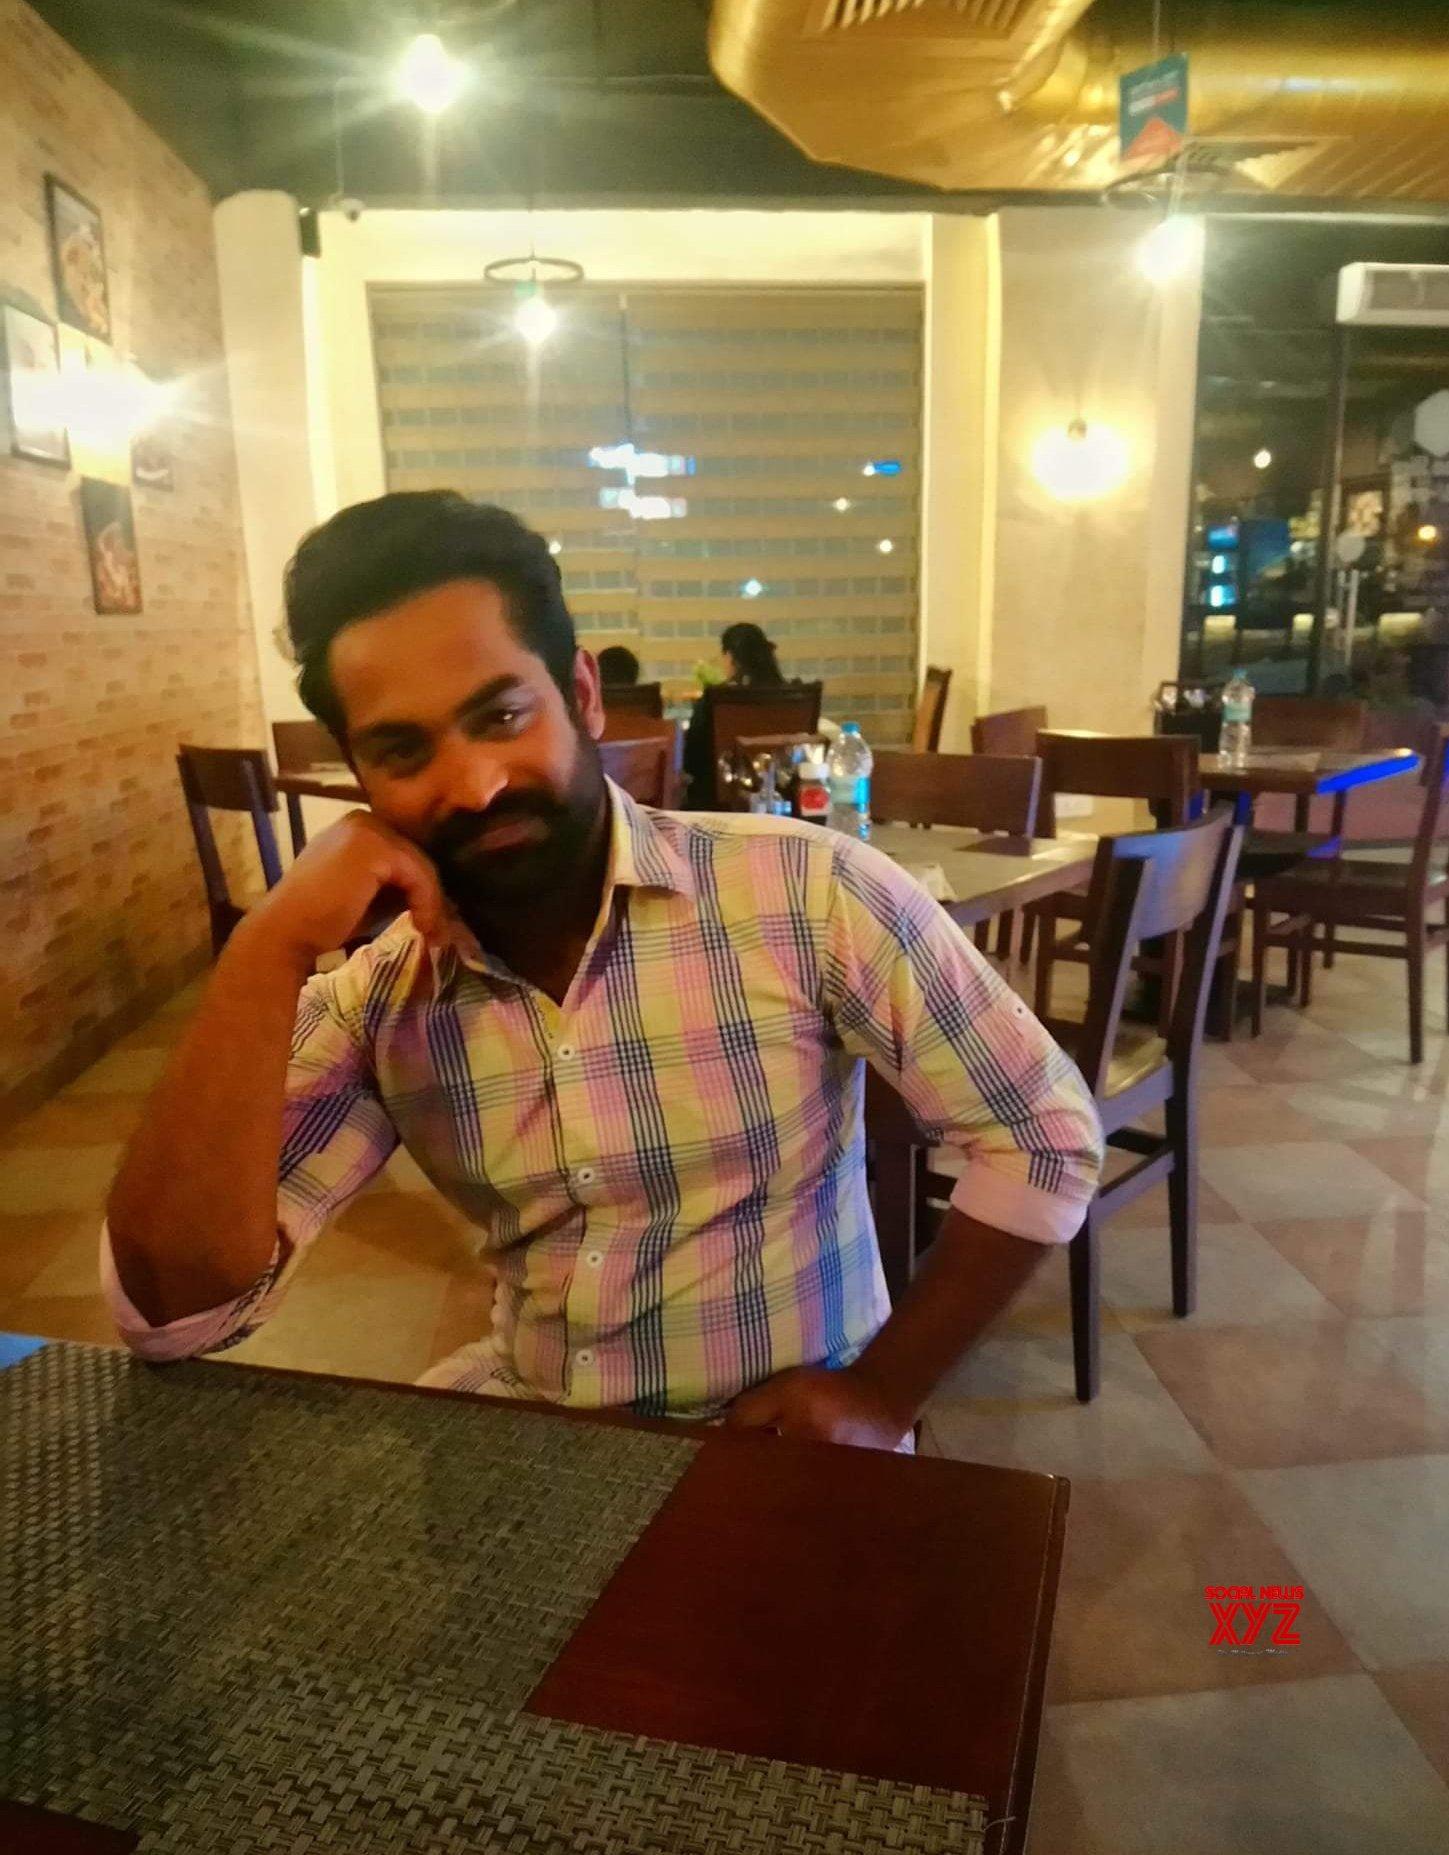 NTR Jr's Doppelganger Shaminder Singh Stills